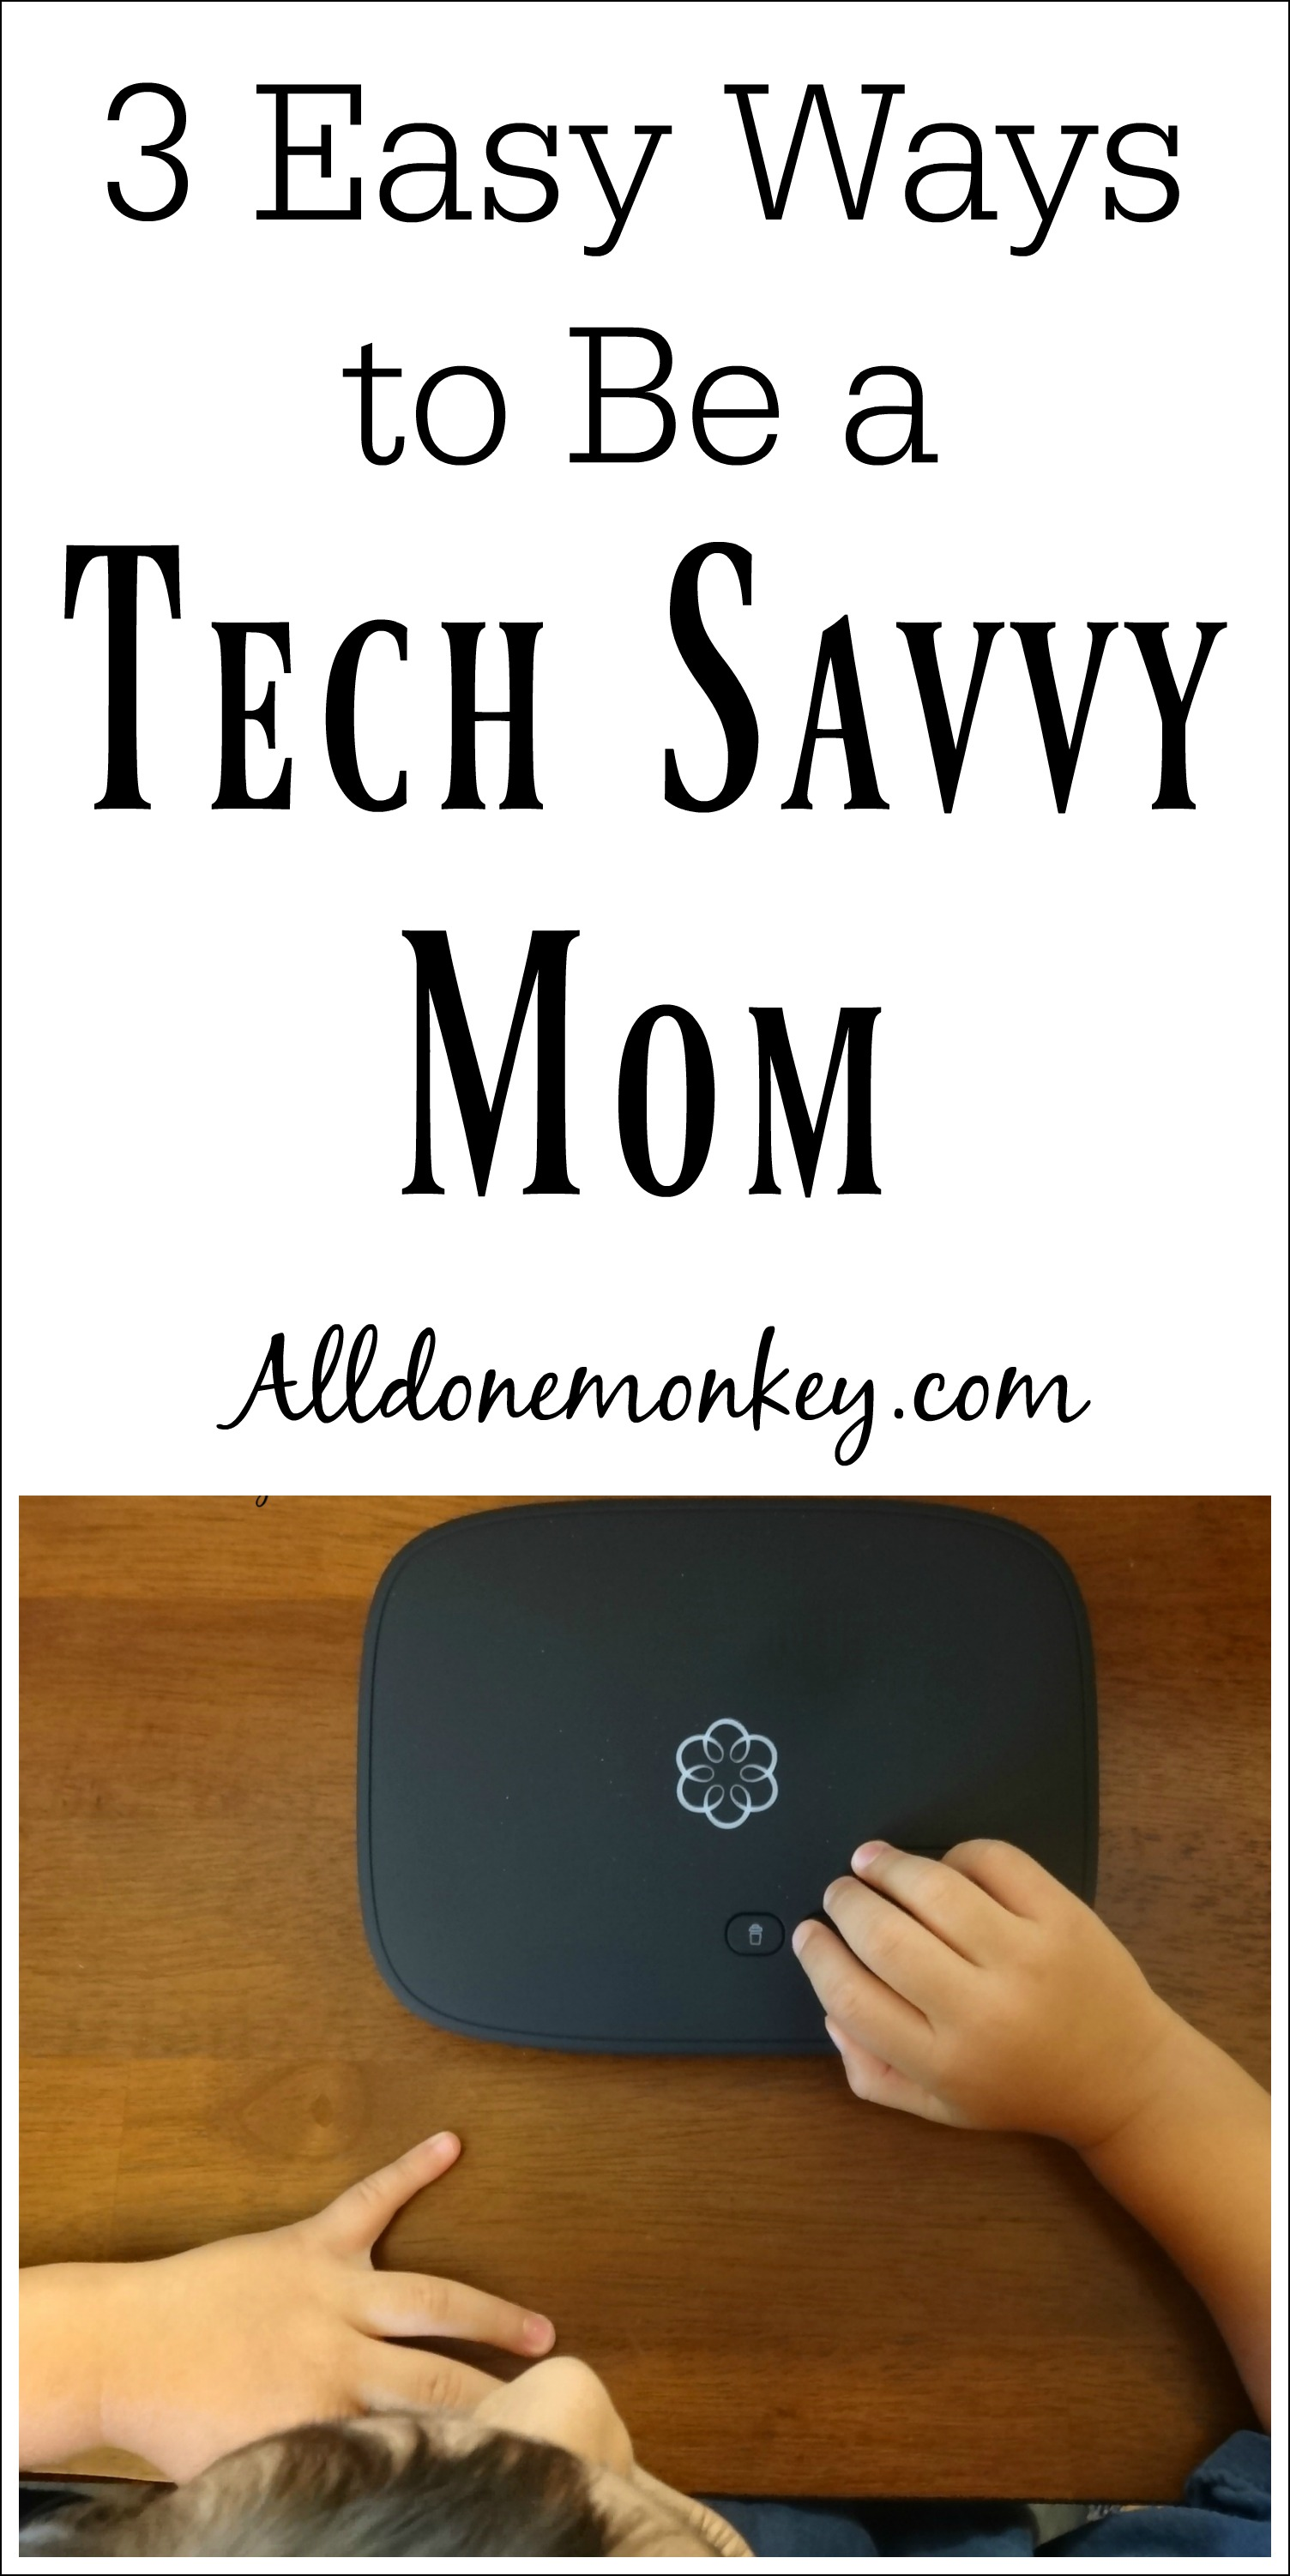 3 Easy Ways to Be a Tech Savvy Mom   Alldonemonkey.com